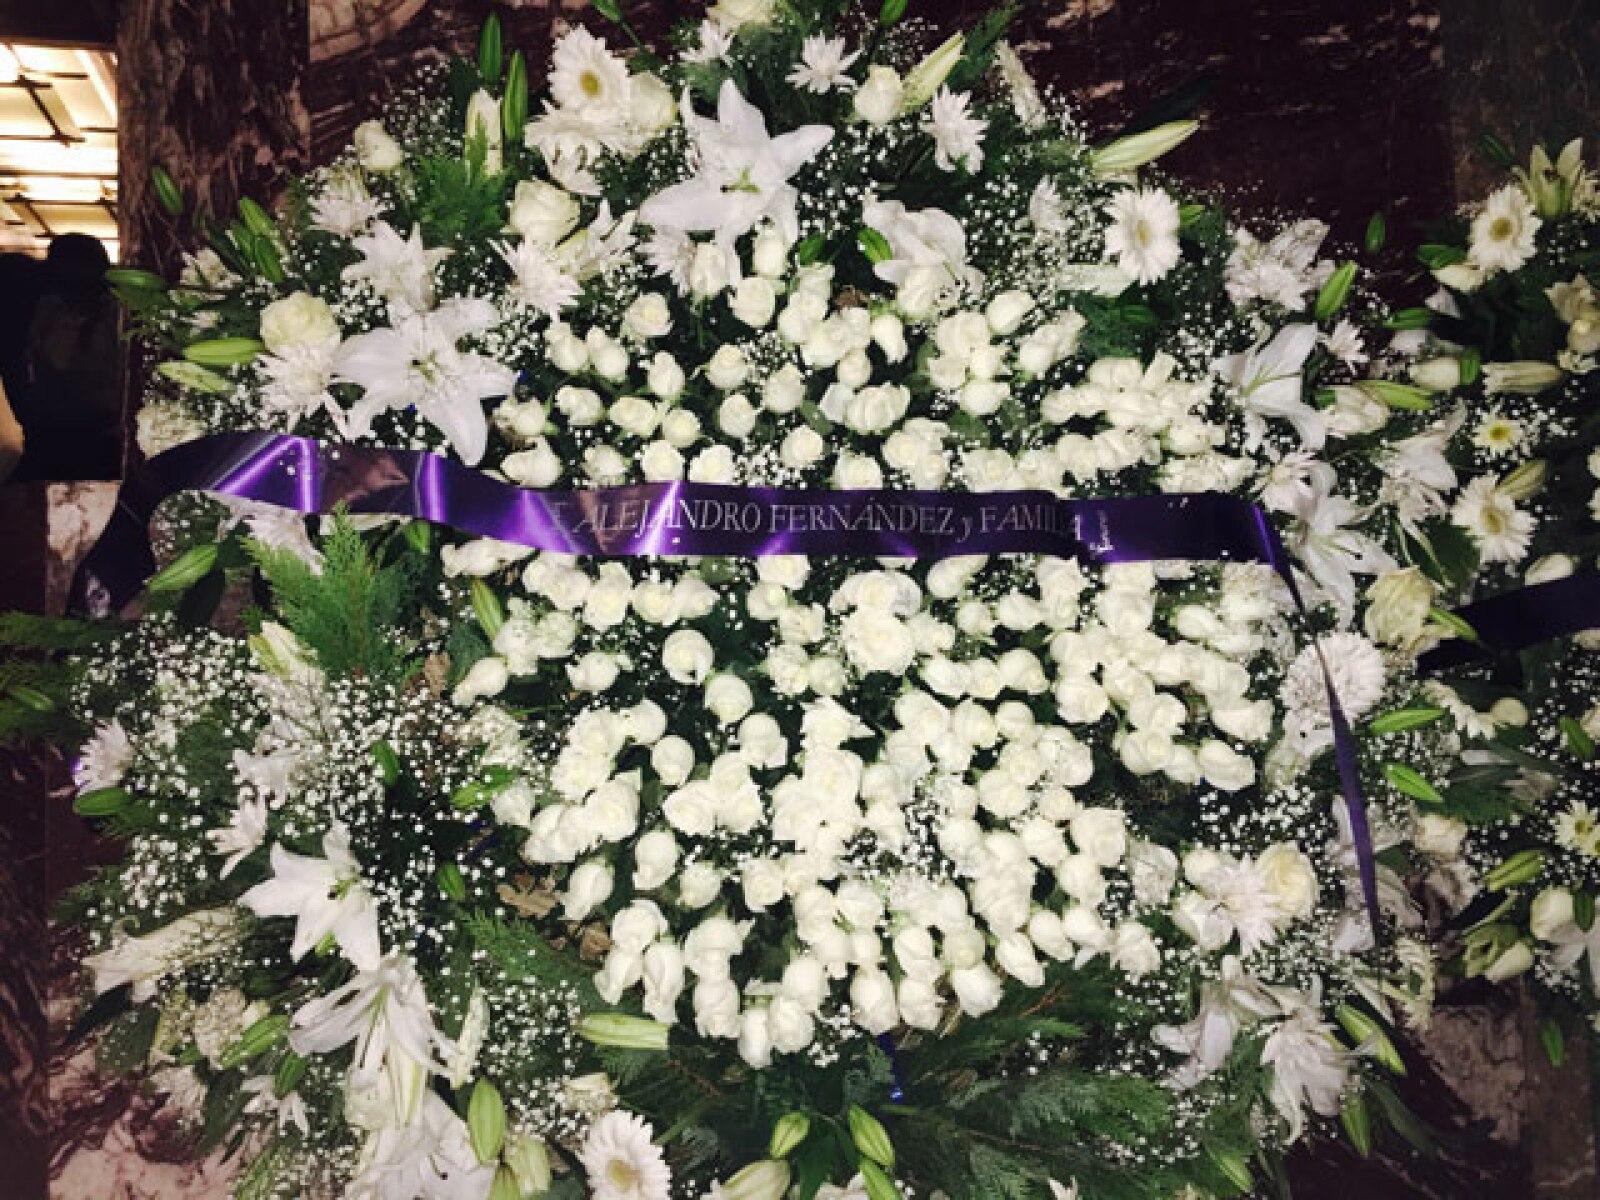 Corona de flores blanca que mandó Alejandro Fernández.